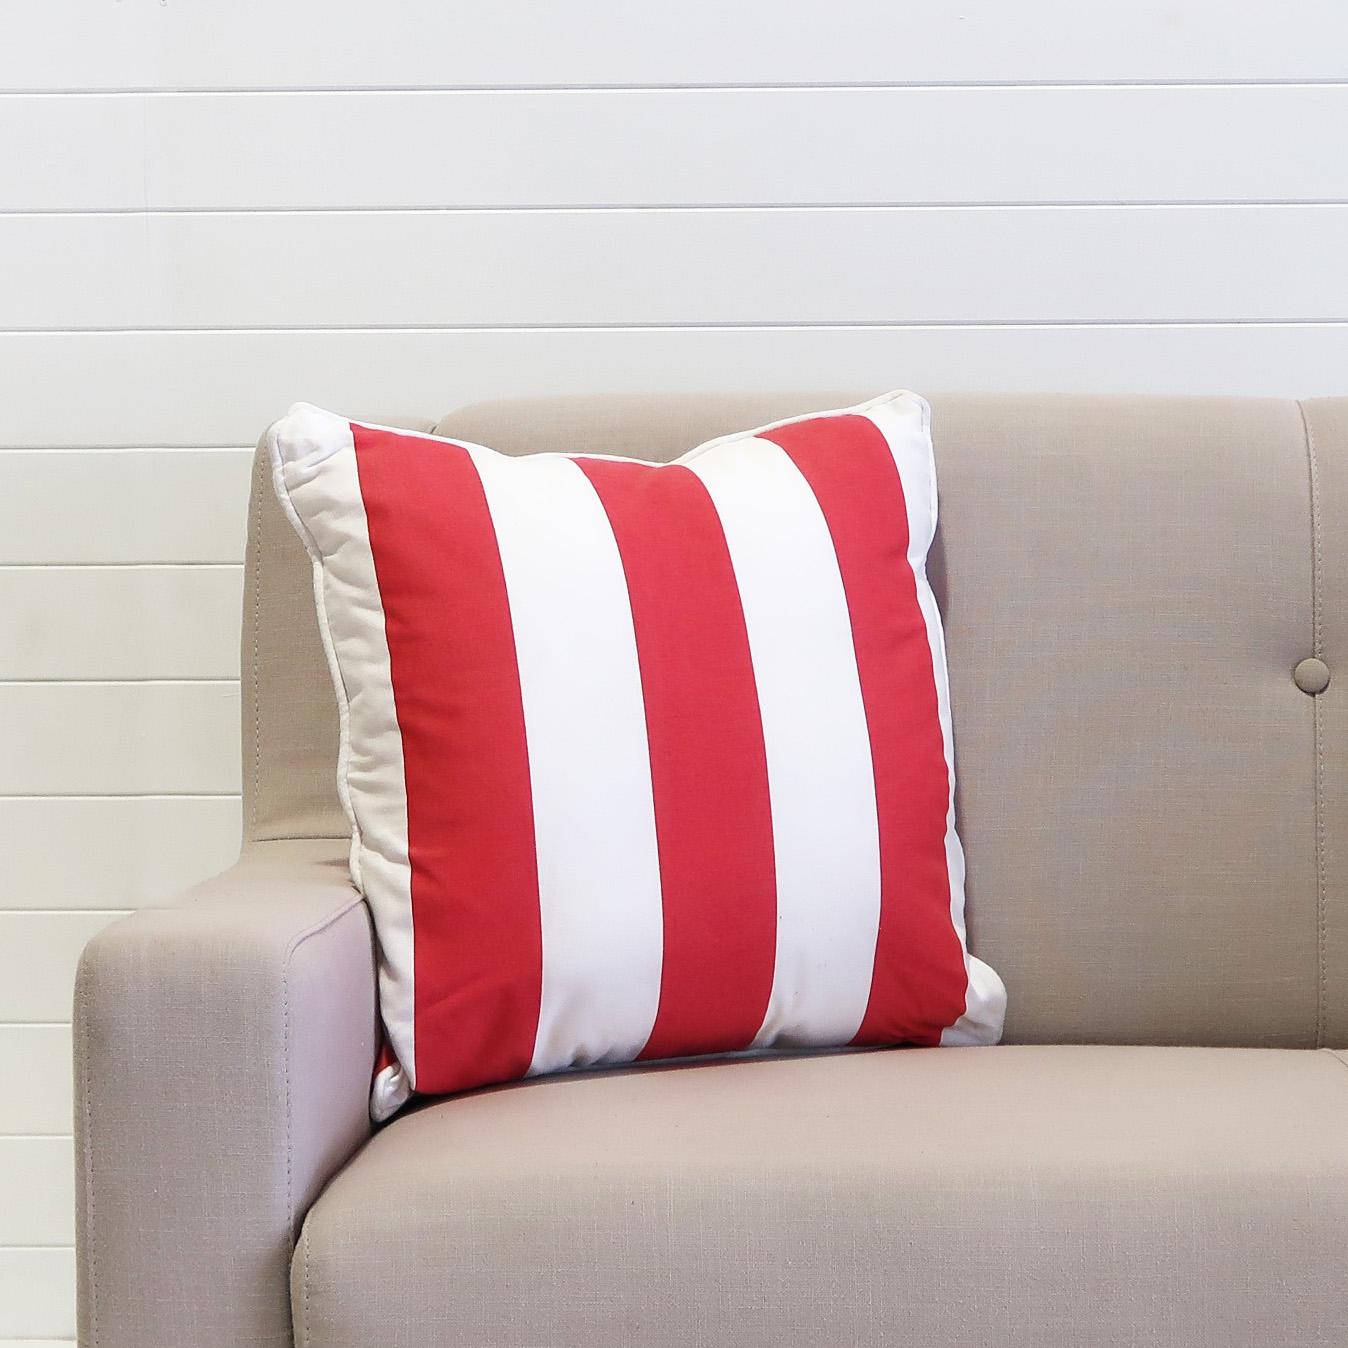 Cushion - Red & White Stripe (alt).JPG